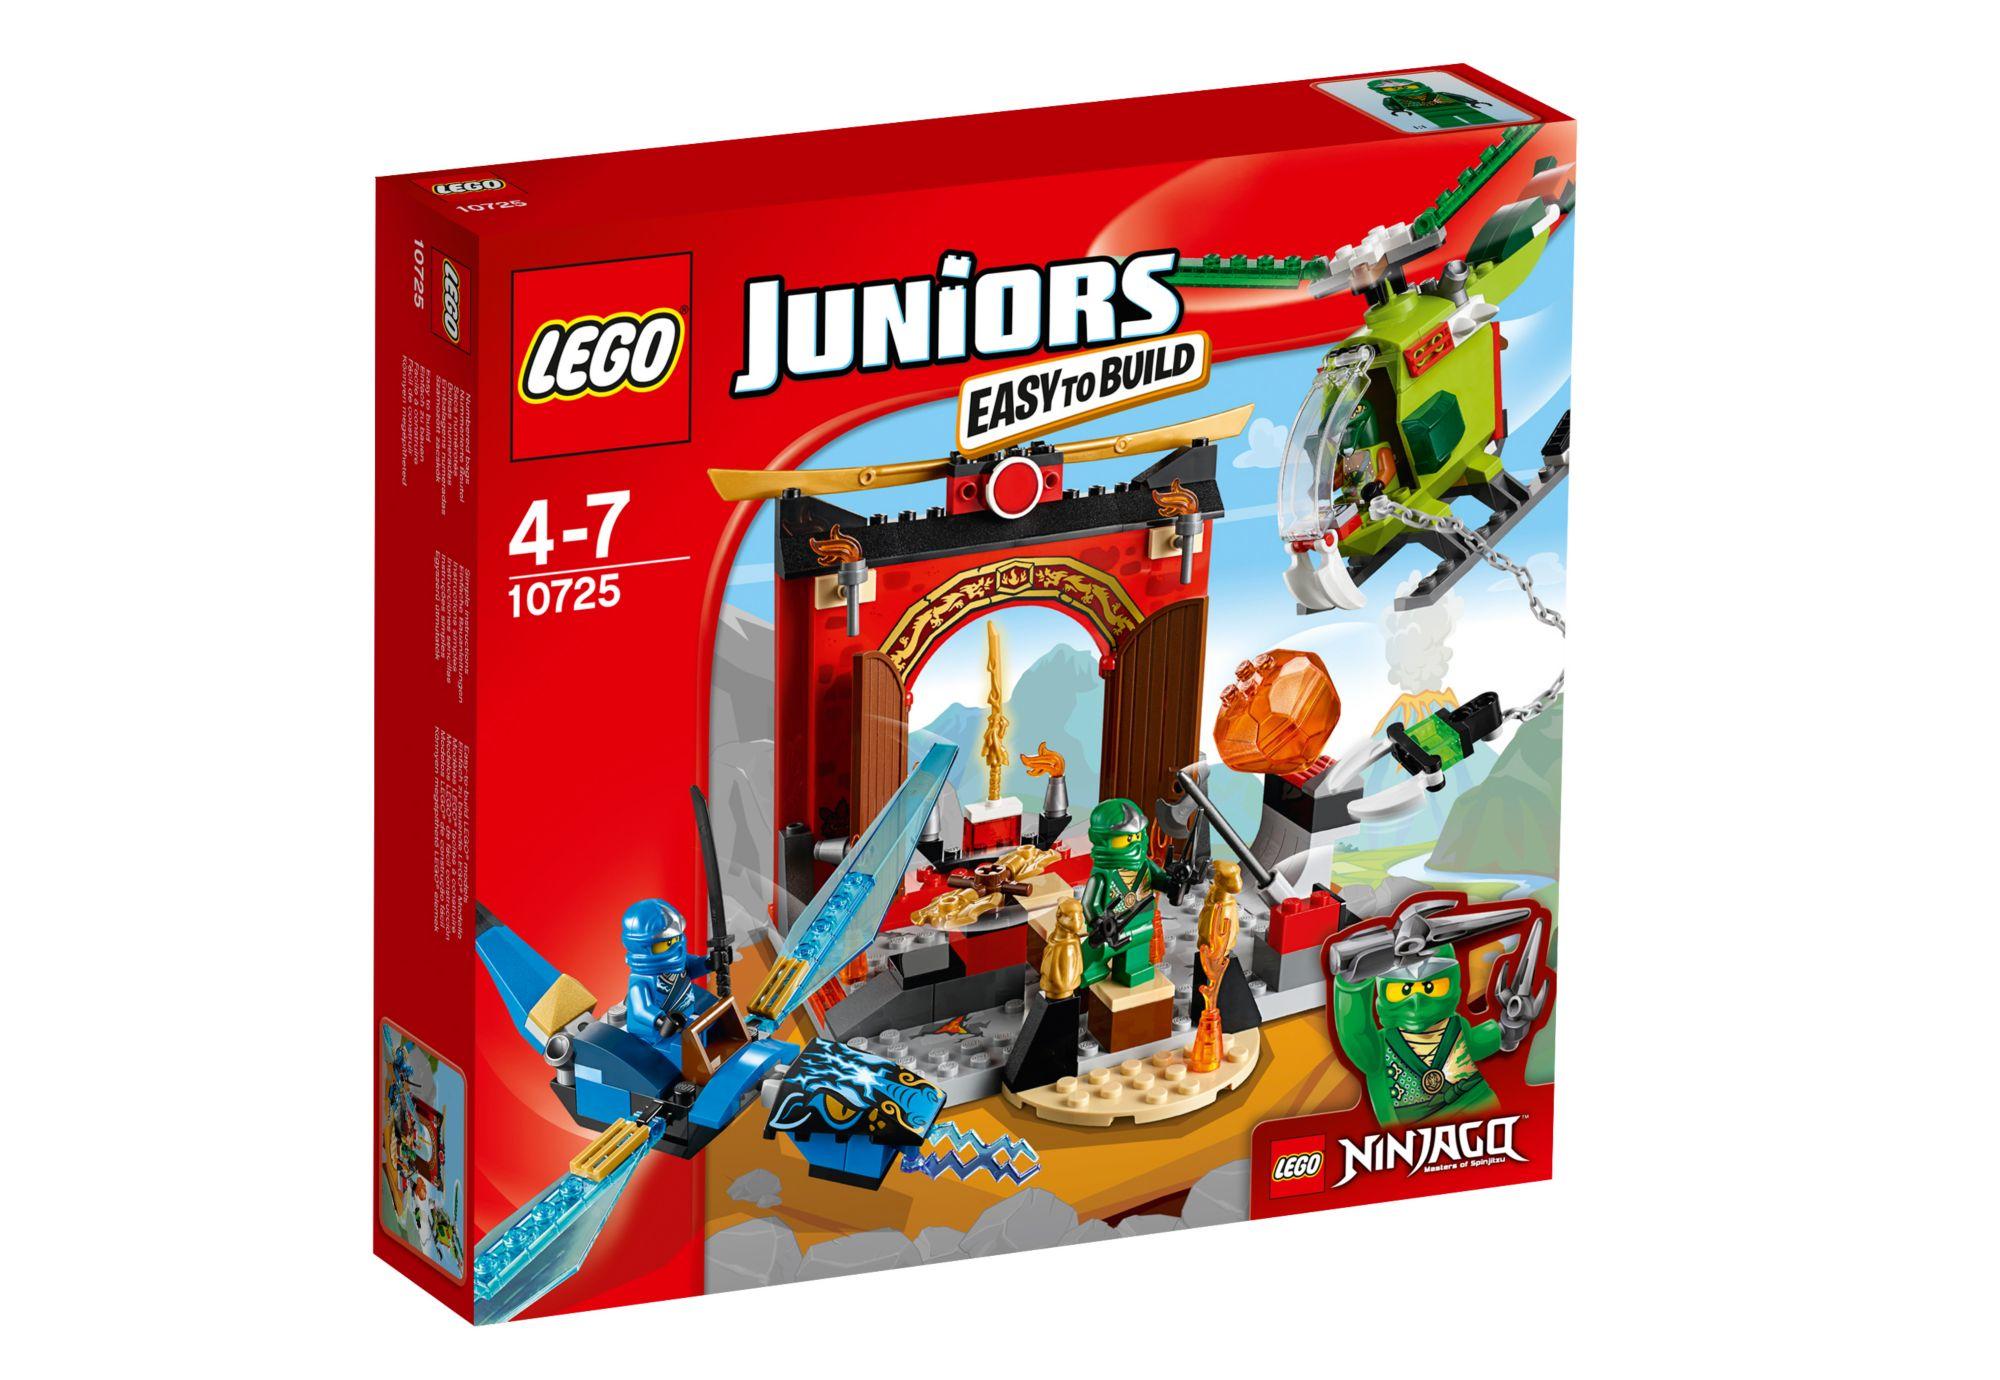 LEGO® 10725 Juniors Der verlorene Tempel, Konstruktionsspielzeug